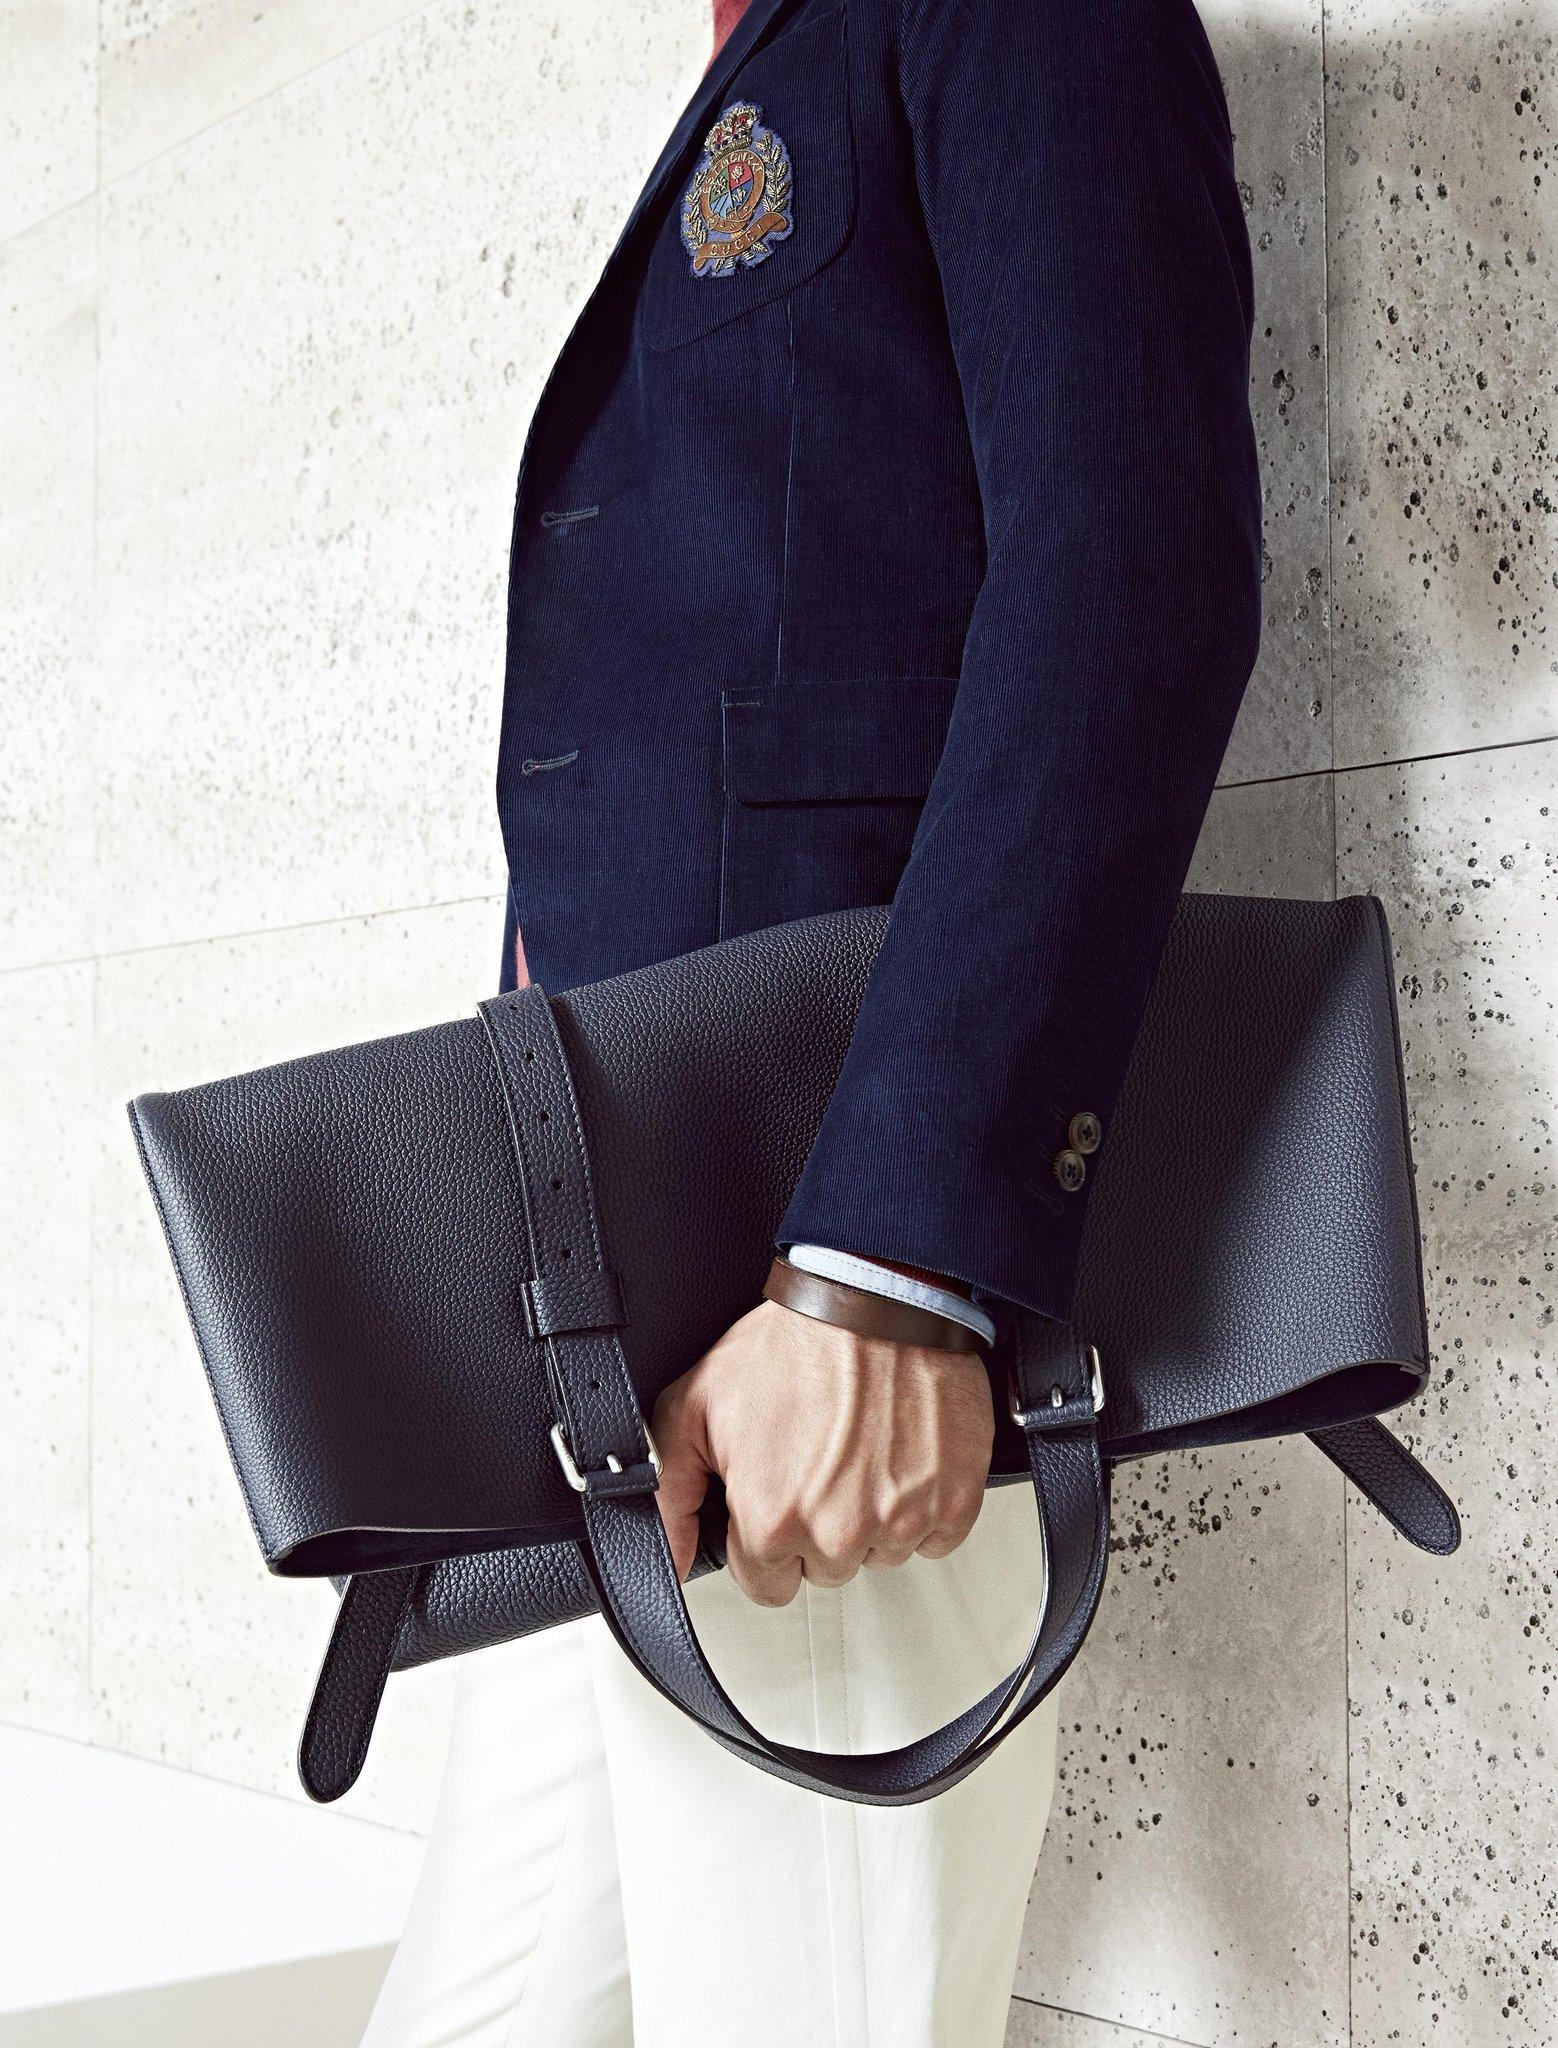 Below the fold. #gucci #accessories #menswear http://t.co/XDfycw1QU5